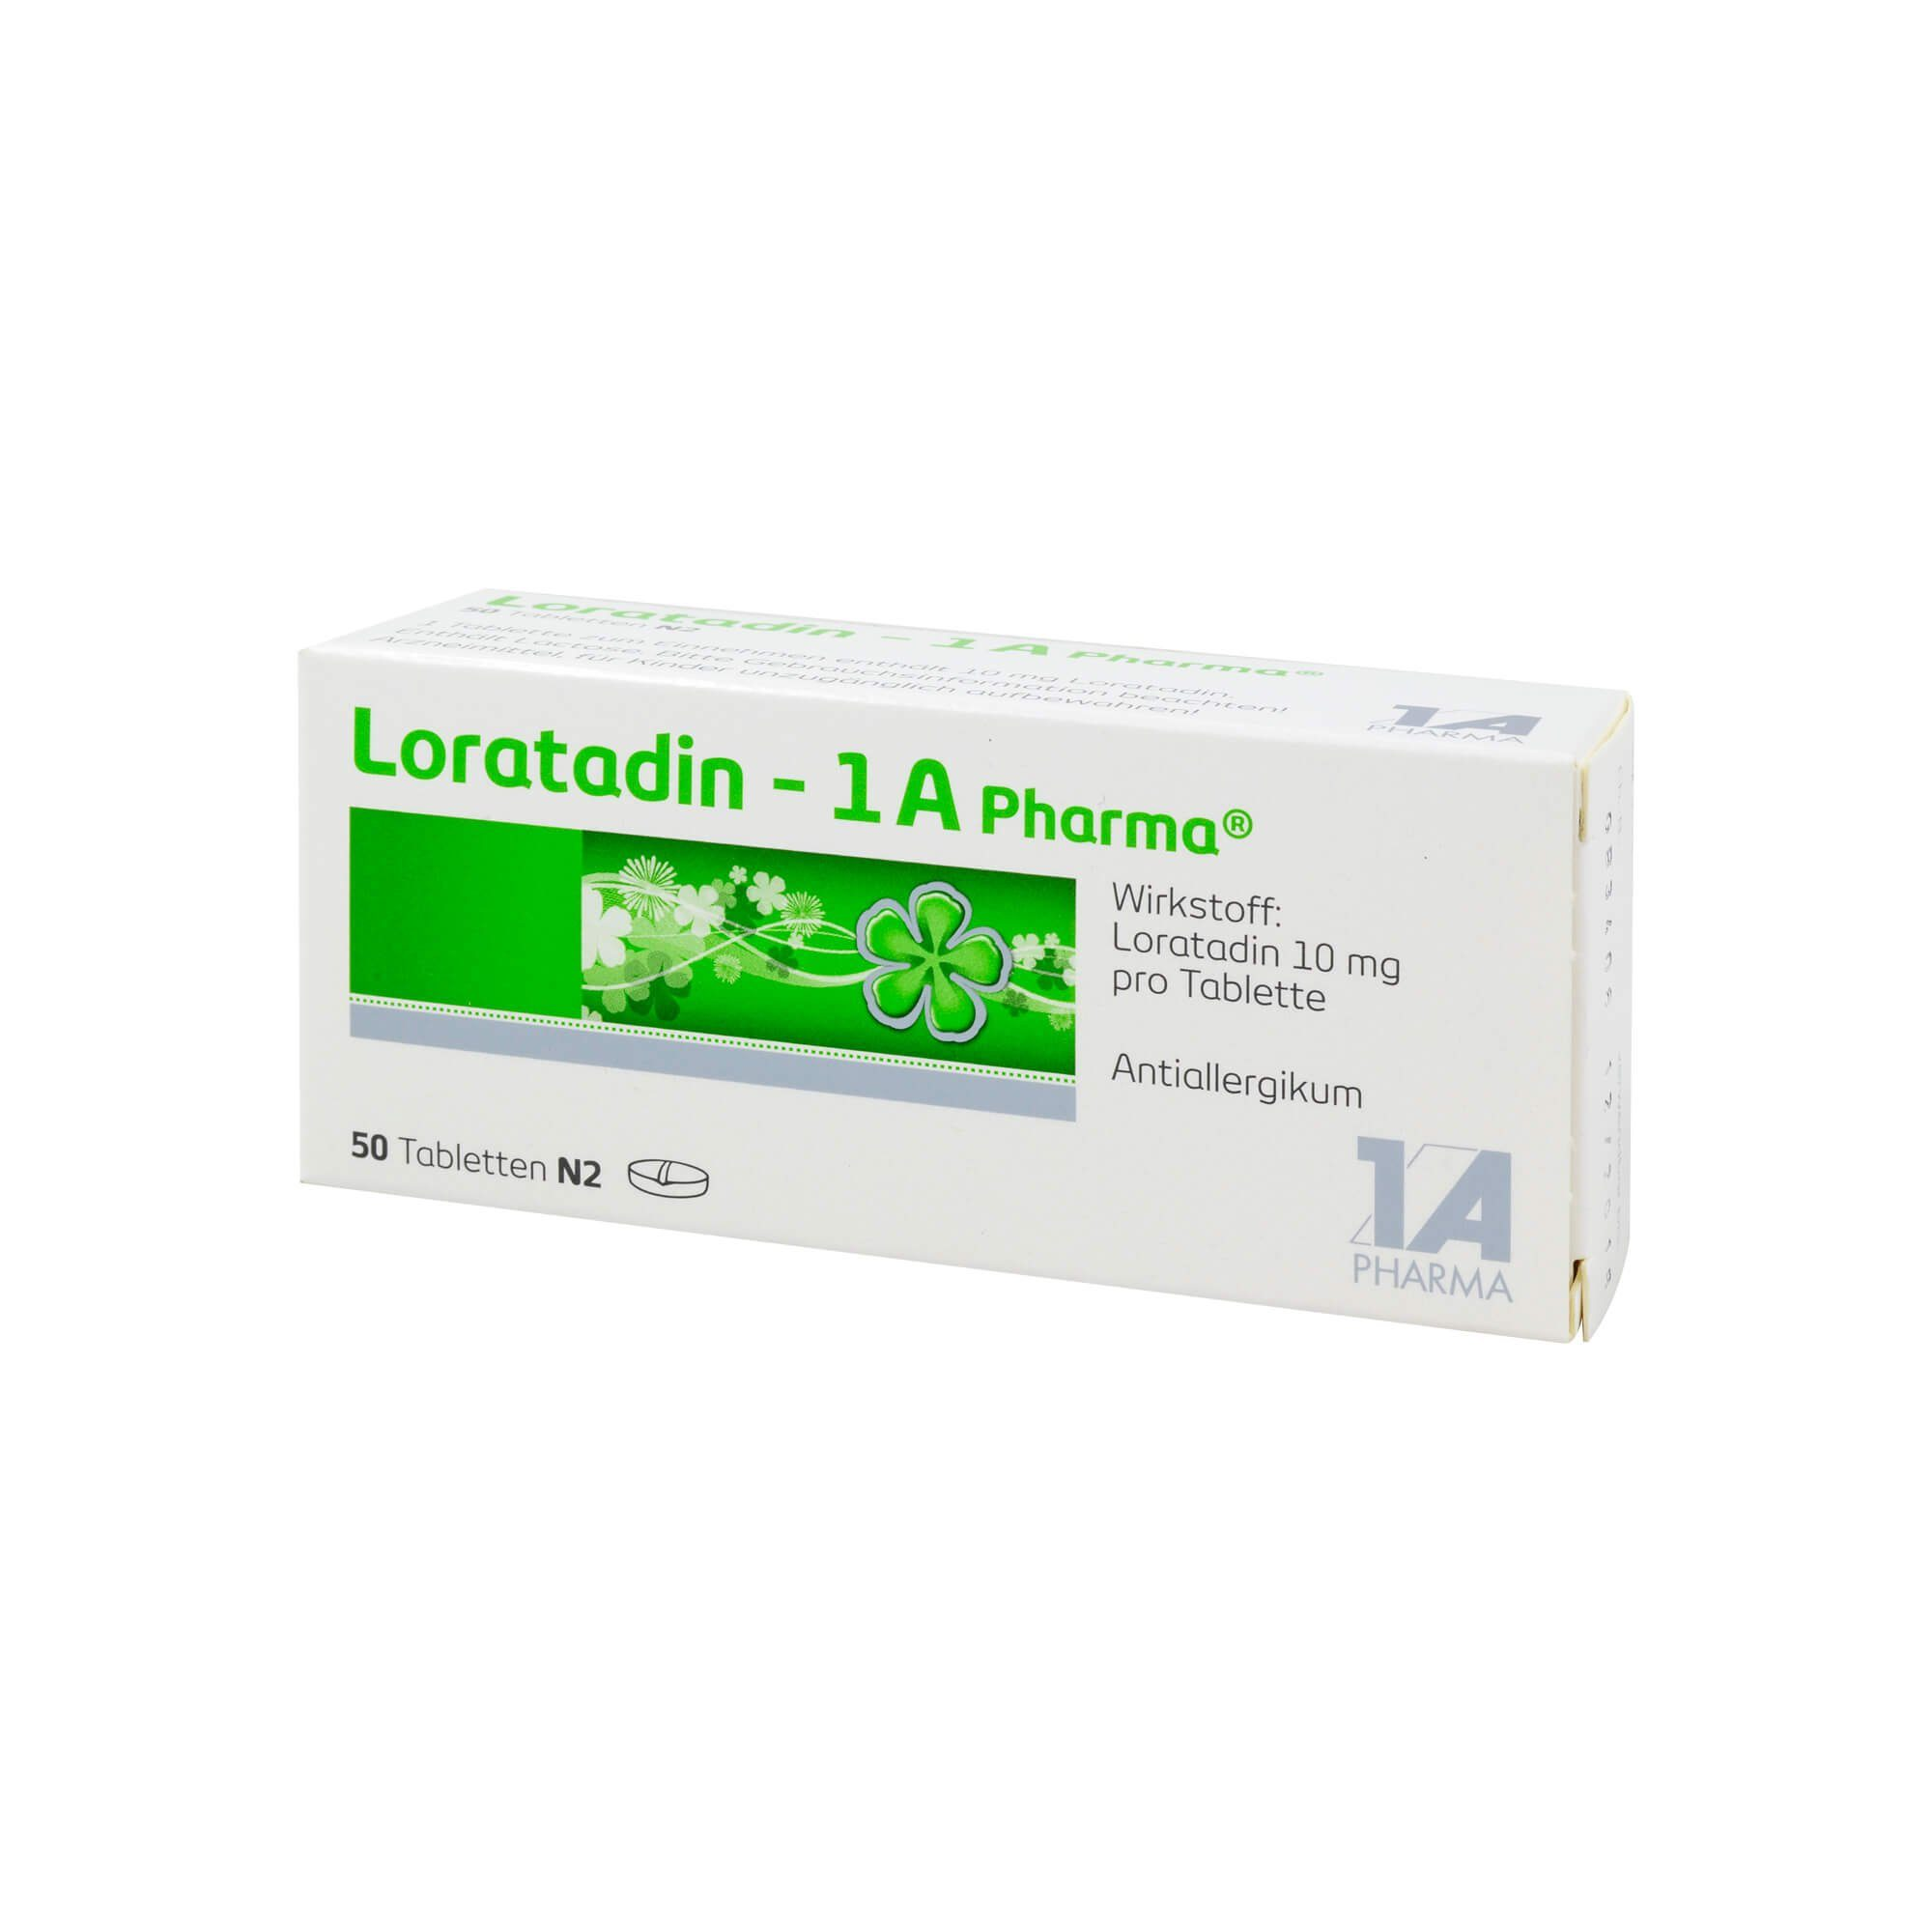 Loratadin 1A Pharma, 50 St